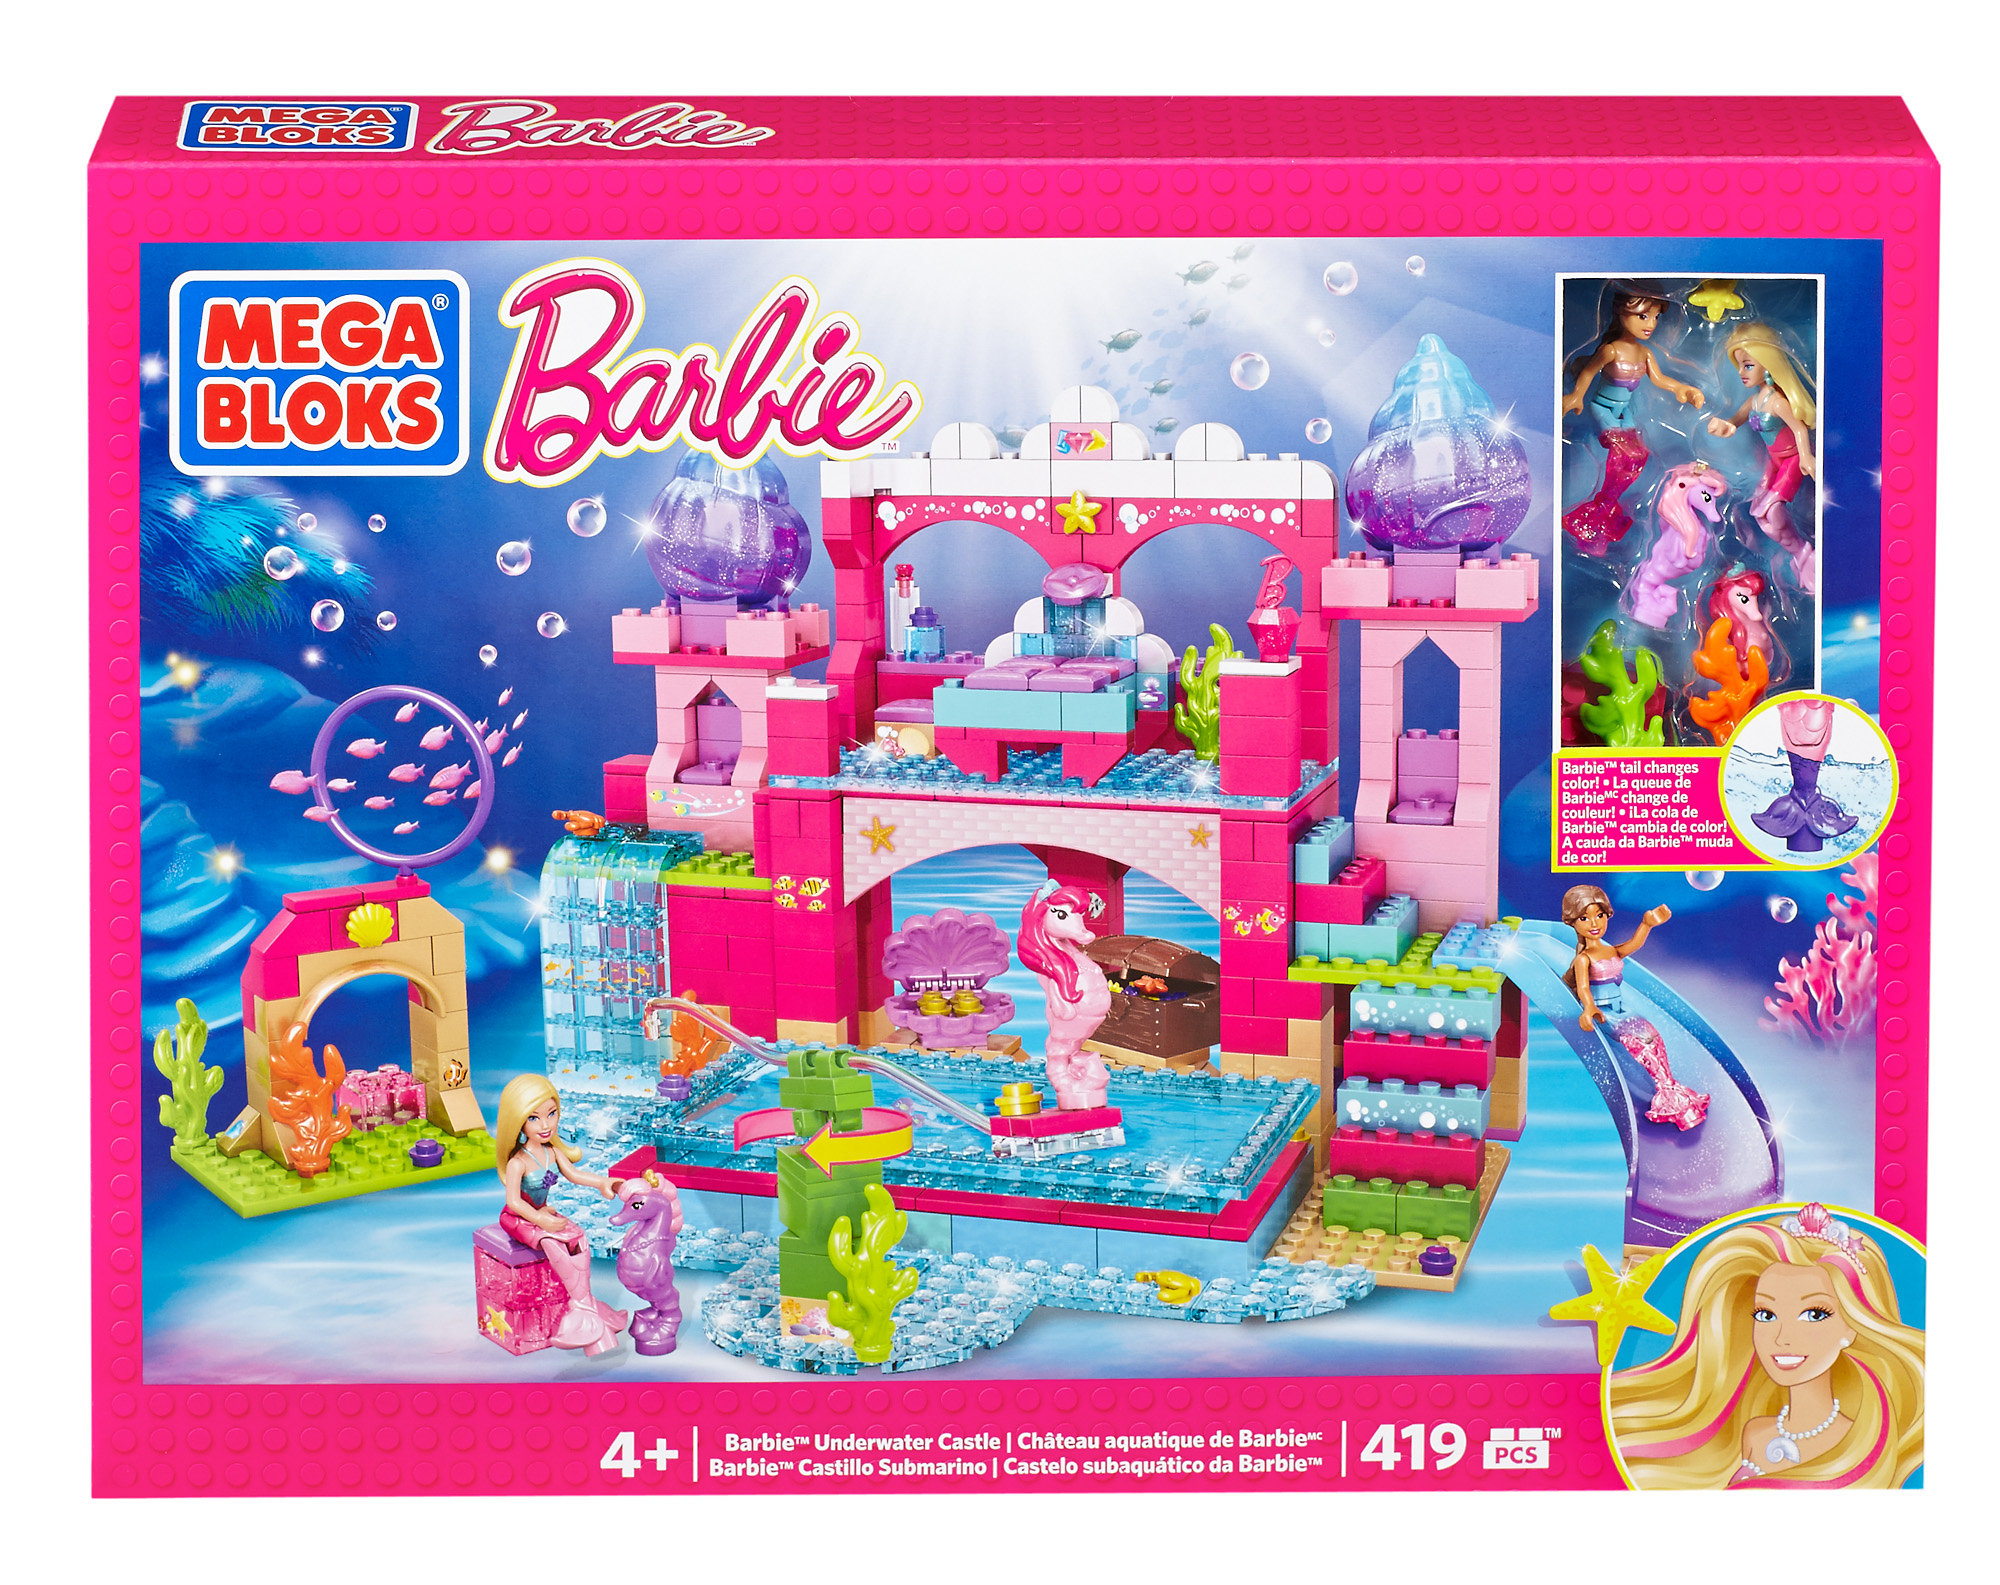 Mega Bloks Barbie's Underwater Castle by Mattel